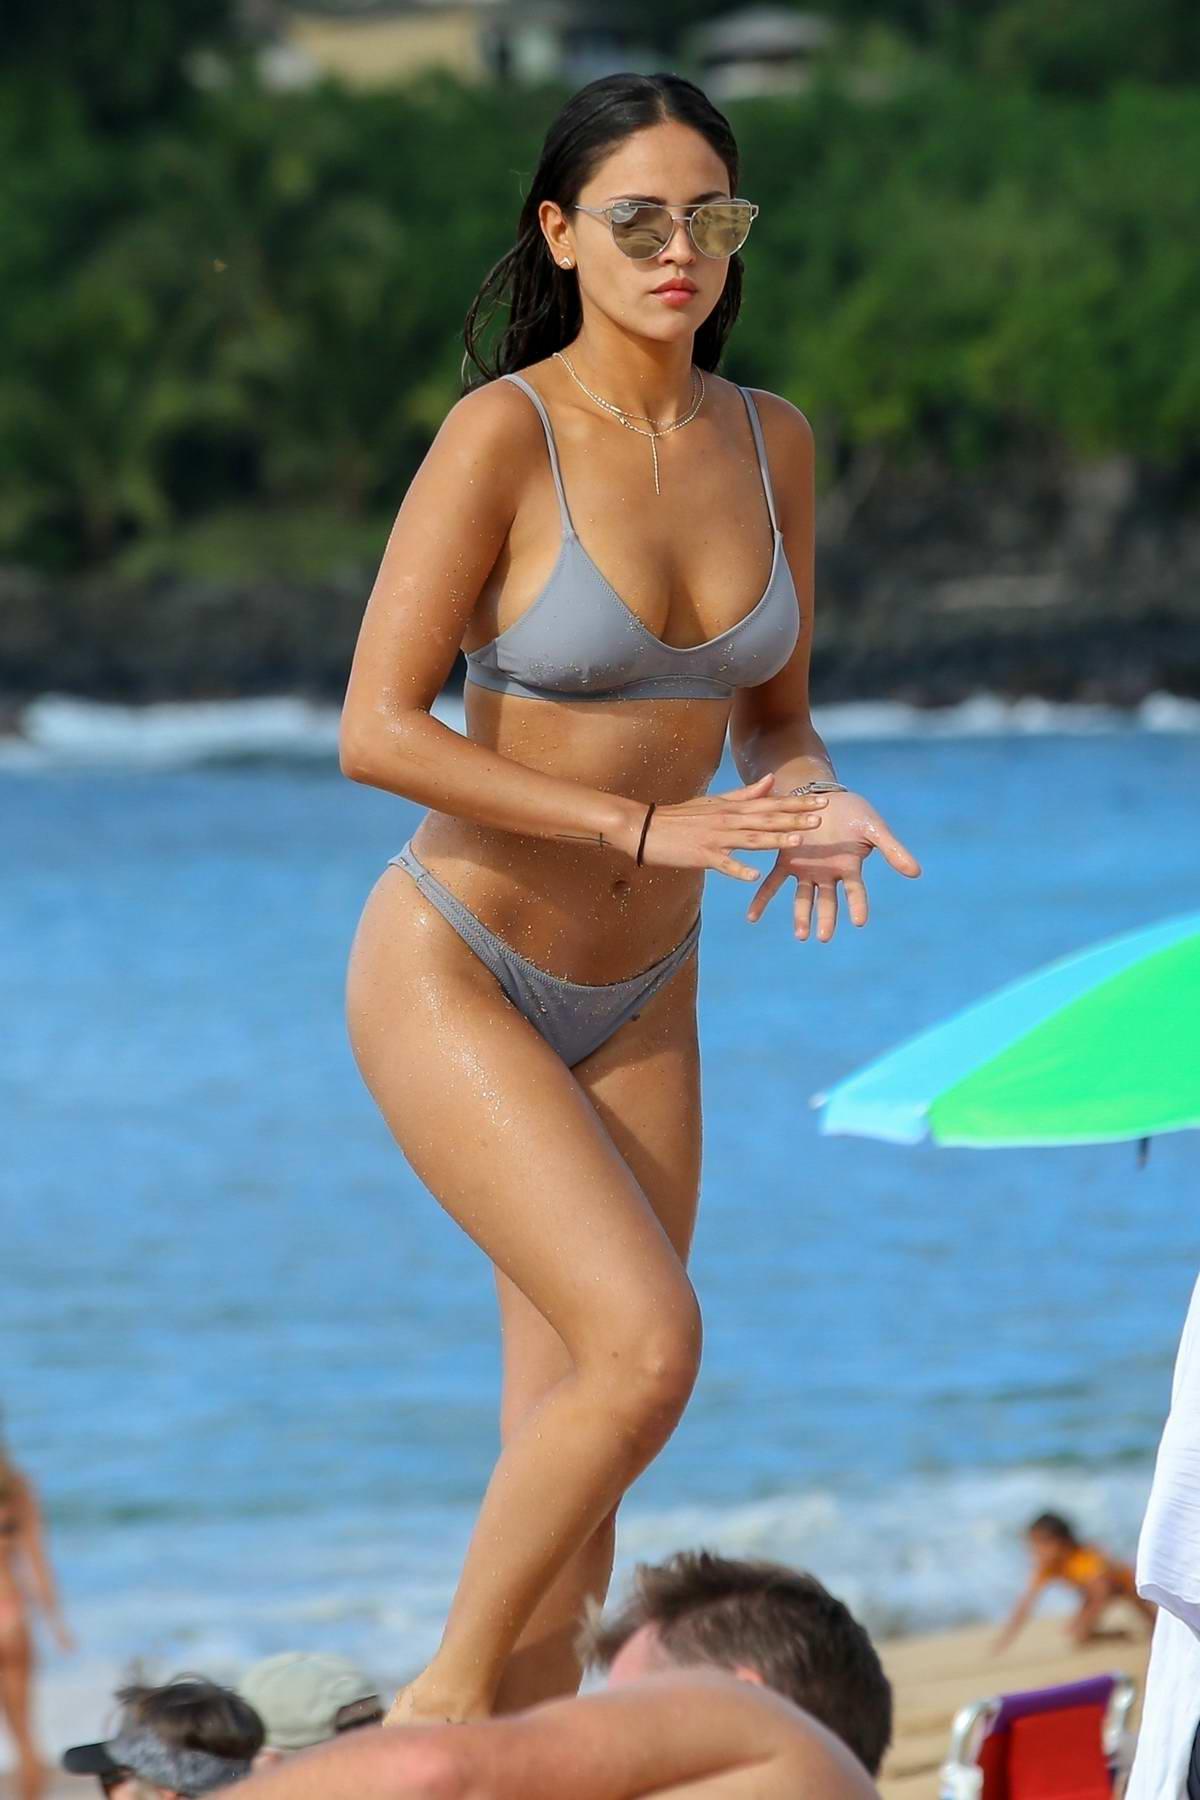 Bikini Eiza Gonzalez nudes (47 photo), Ass, Hot, Feet, swimsuit 2018